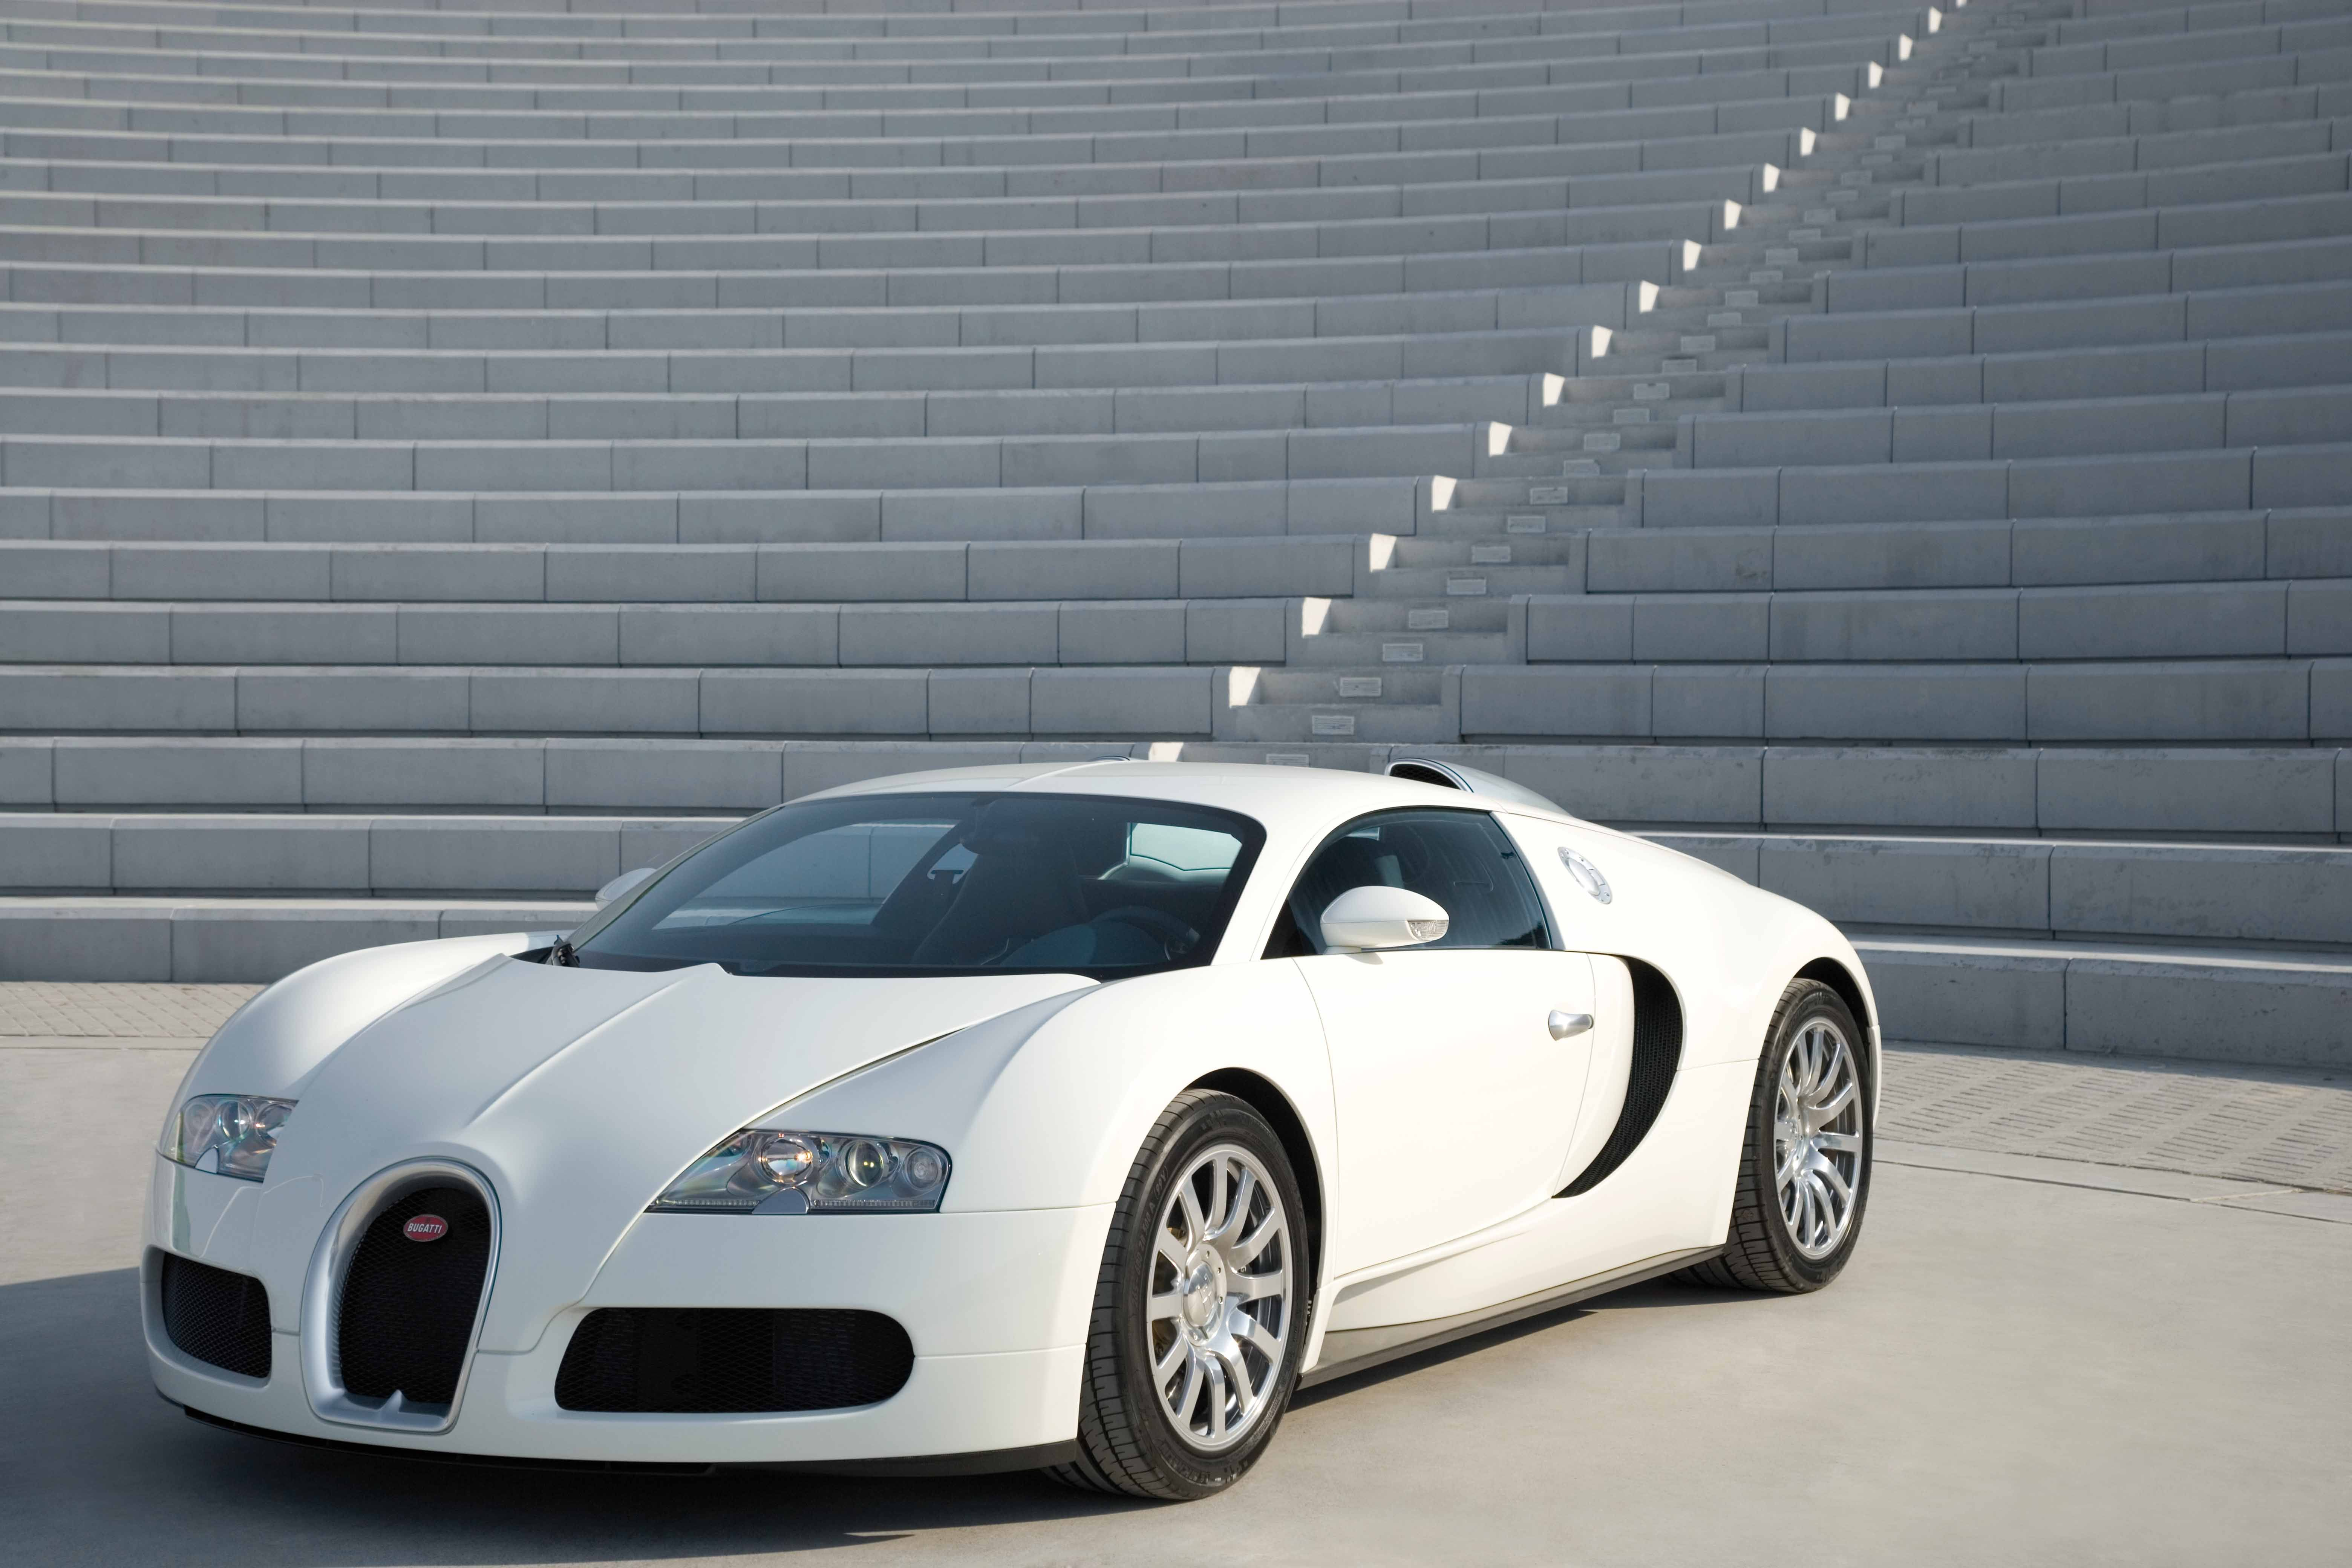 All New Bugatti Veyron In Diamond White Colour To Know More About This Contact Quikrcars Bugatti Veyron Bugatti Super Cars